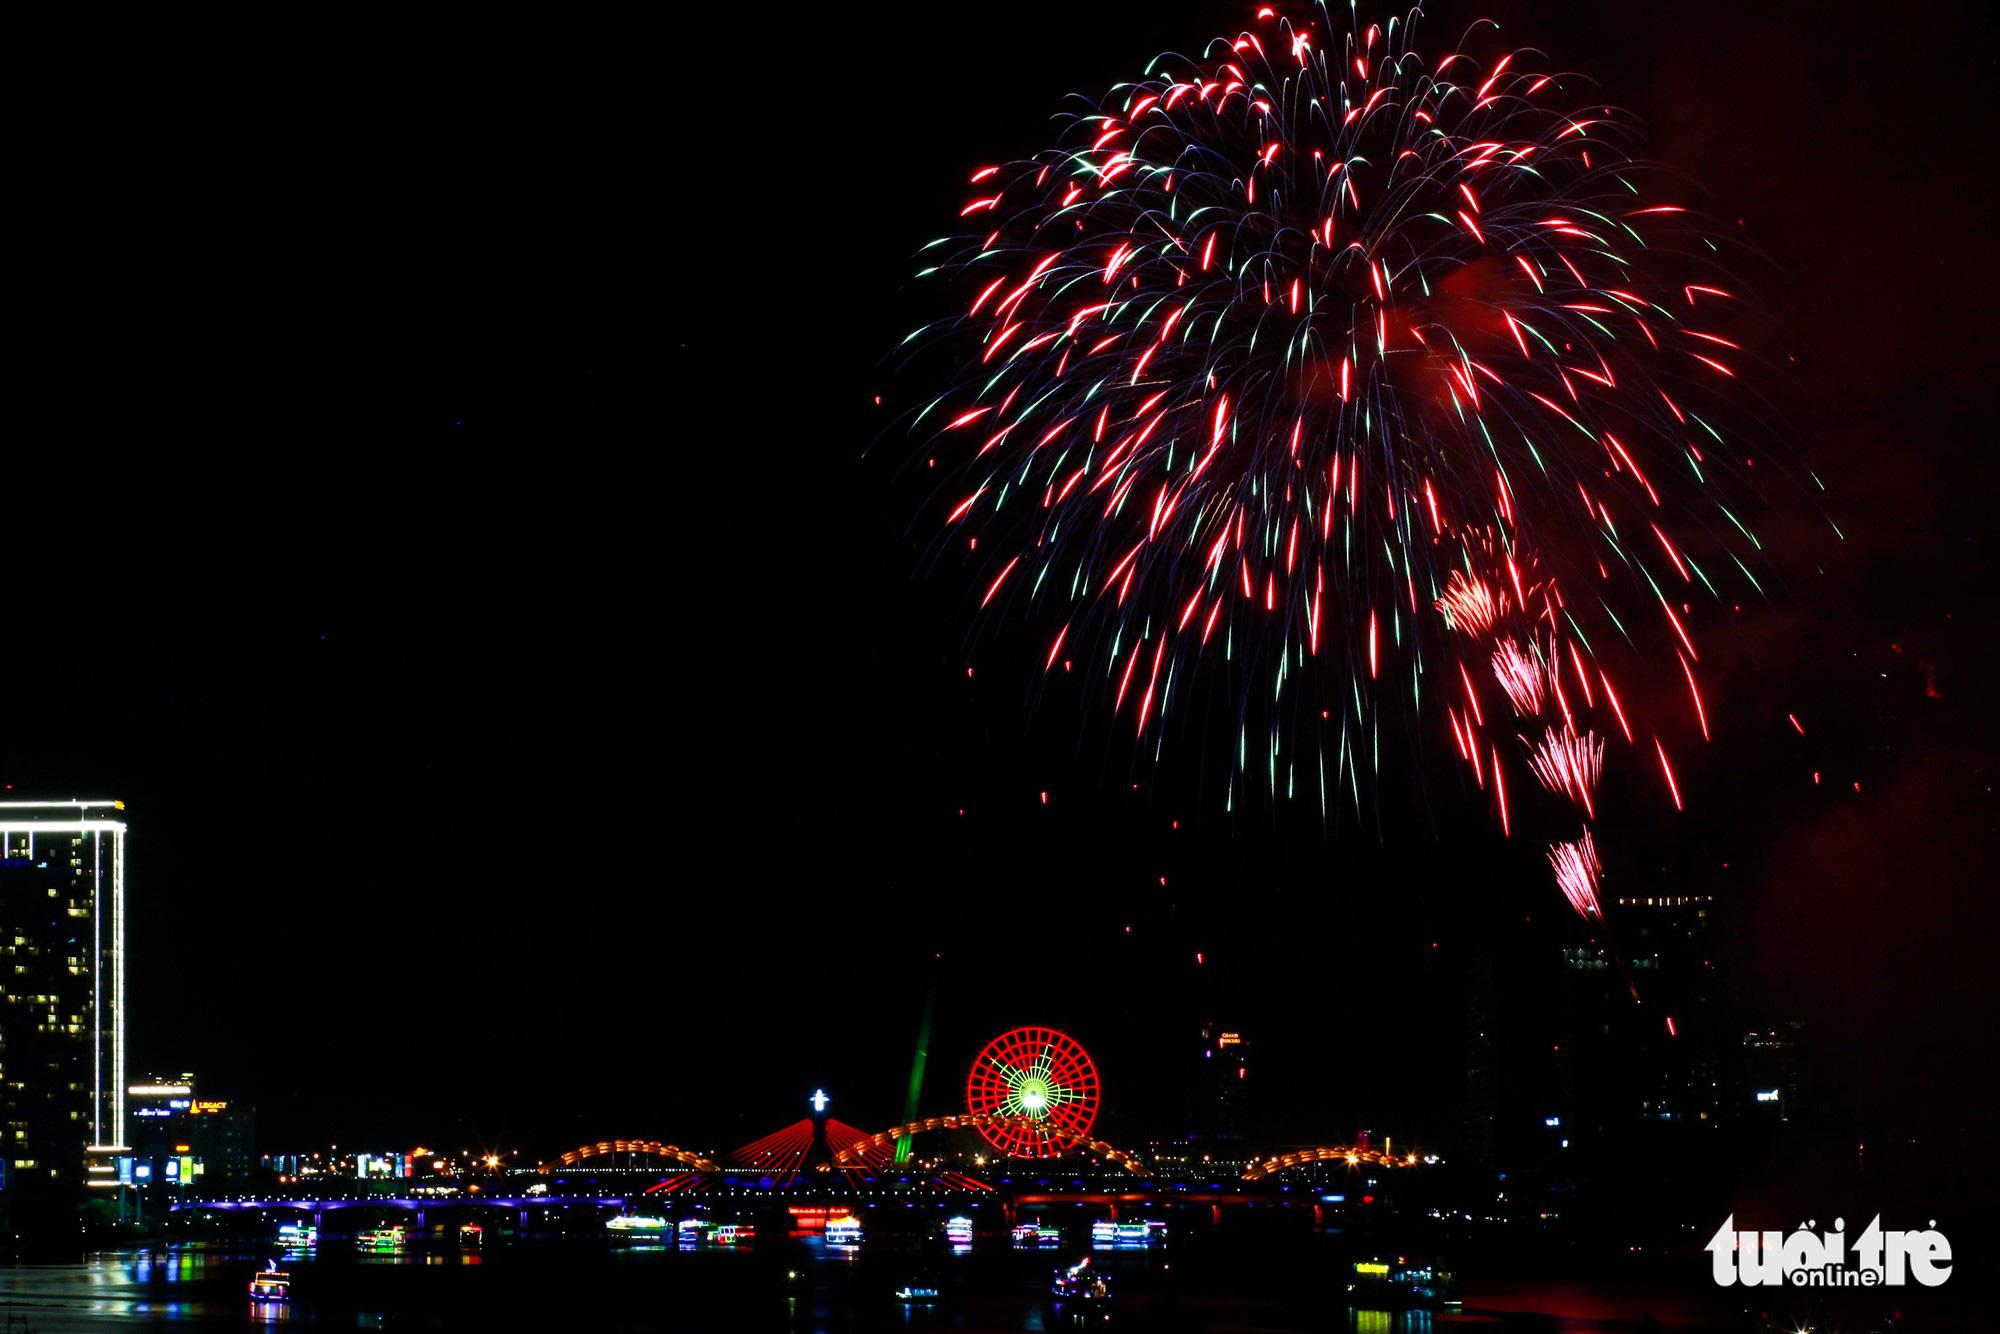 Da Nang cancels 2020 fireworks festival due to COVID-19